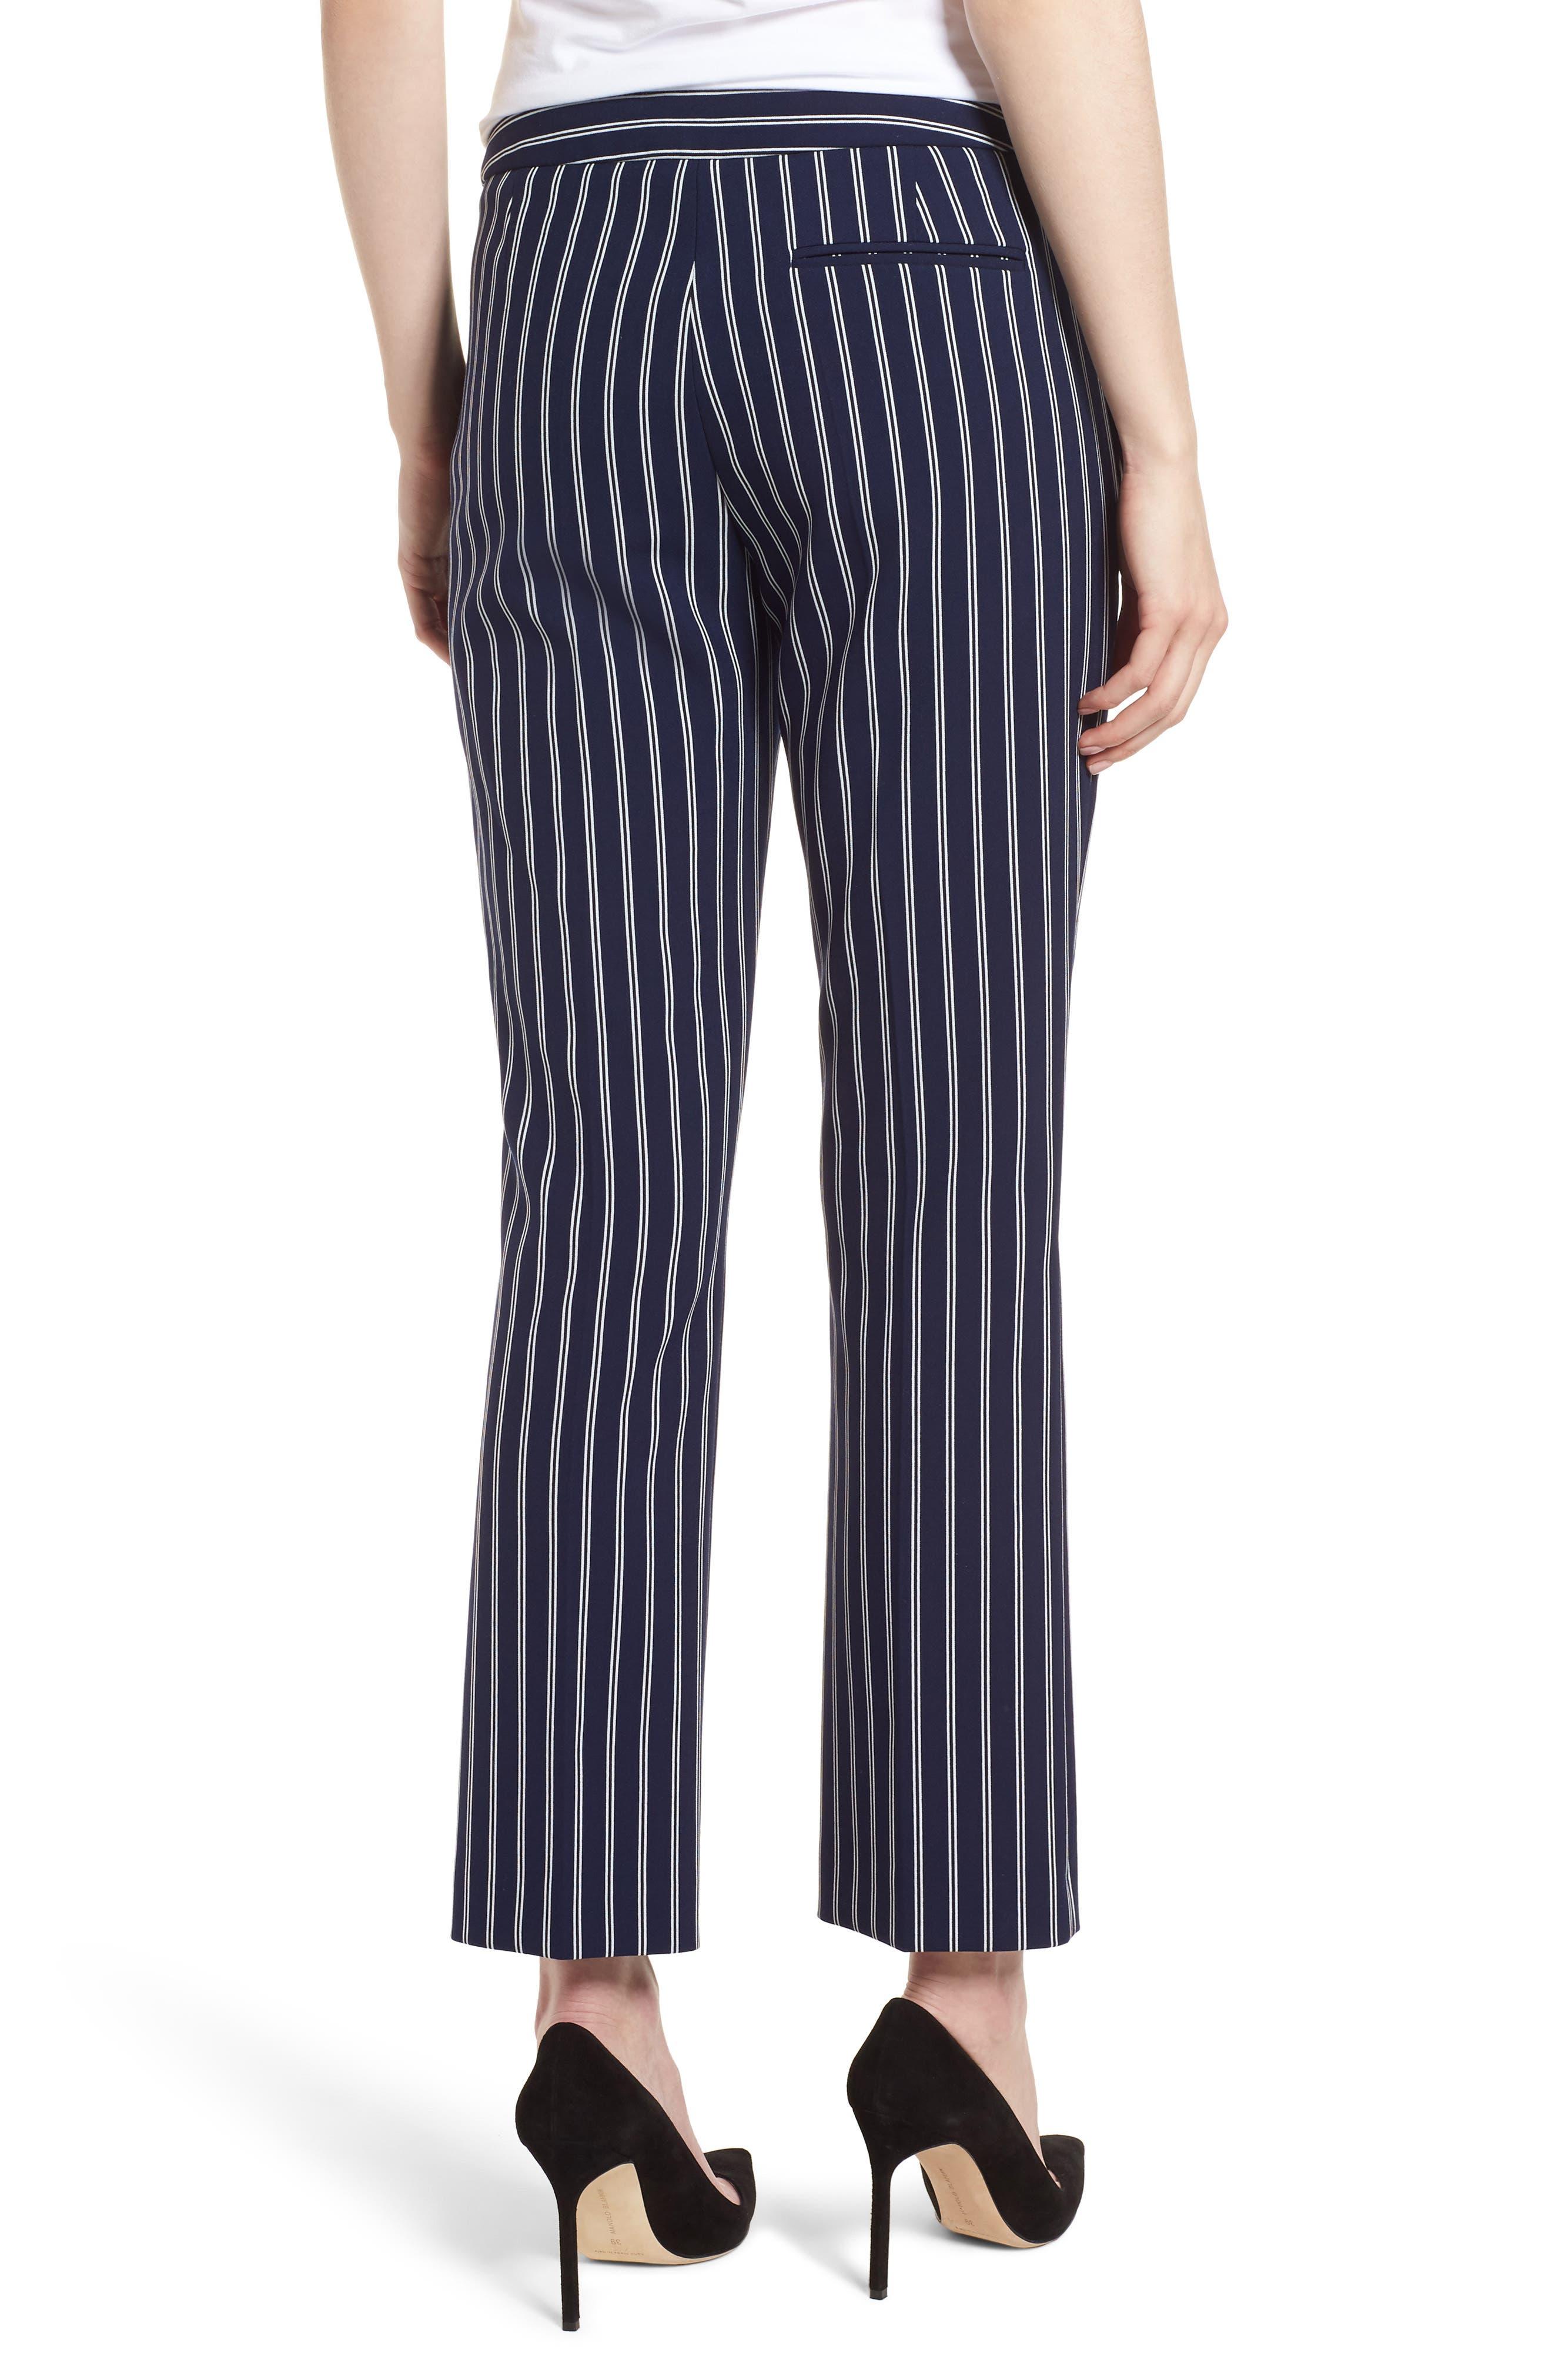 Tebella Stripe Pants,                             Alternate thumbnail 2, color,